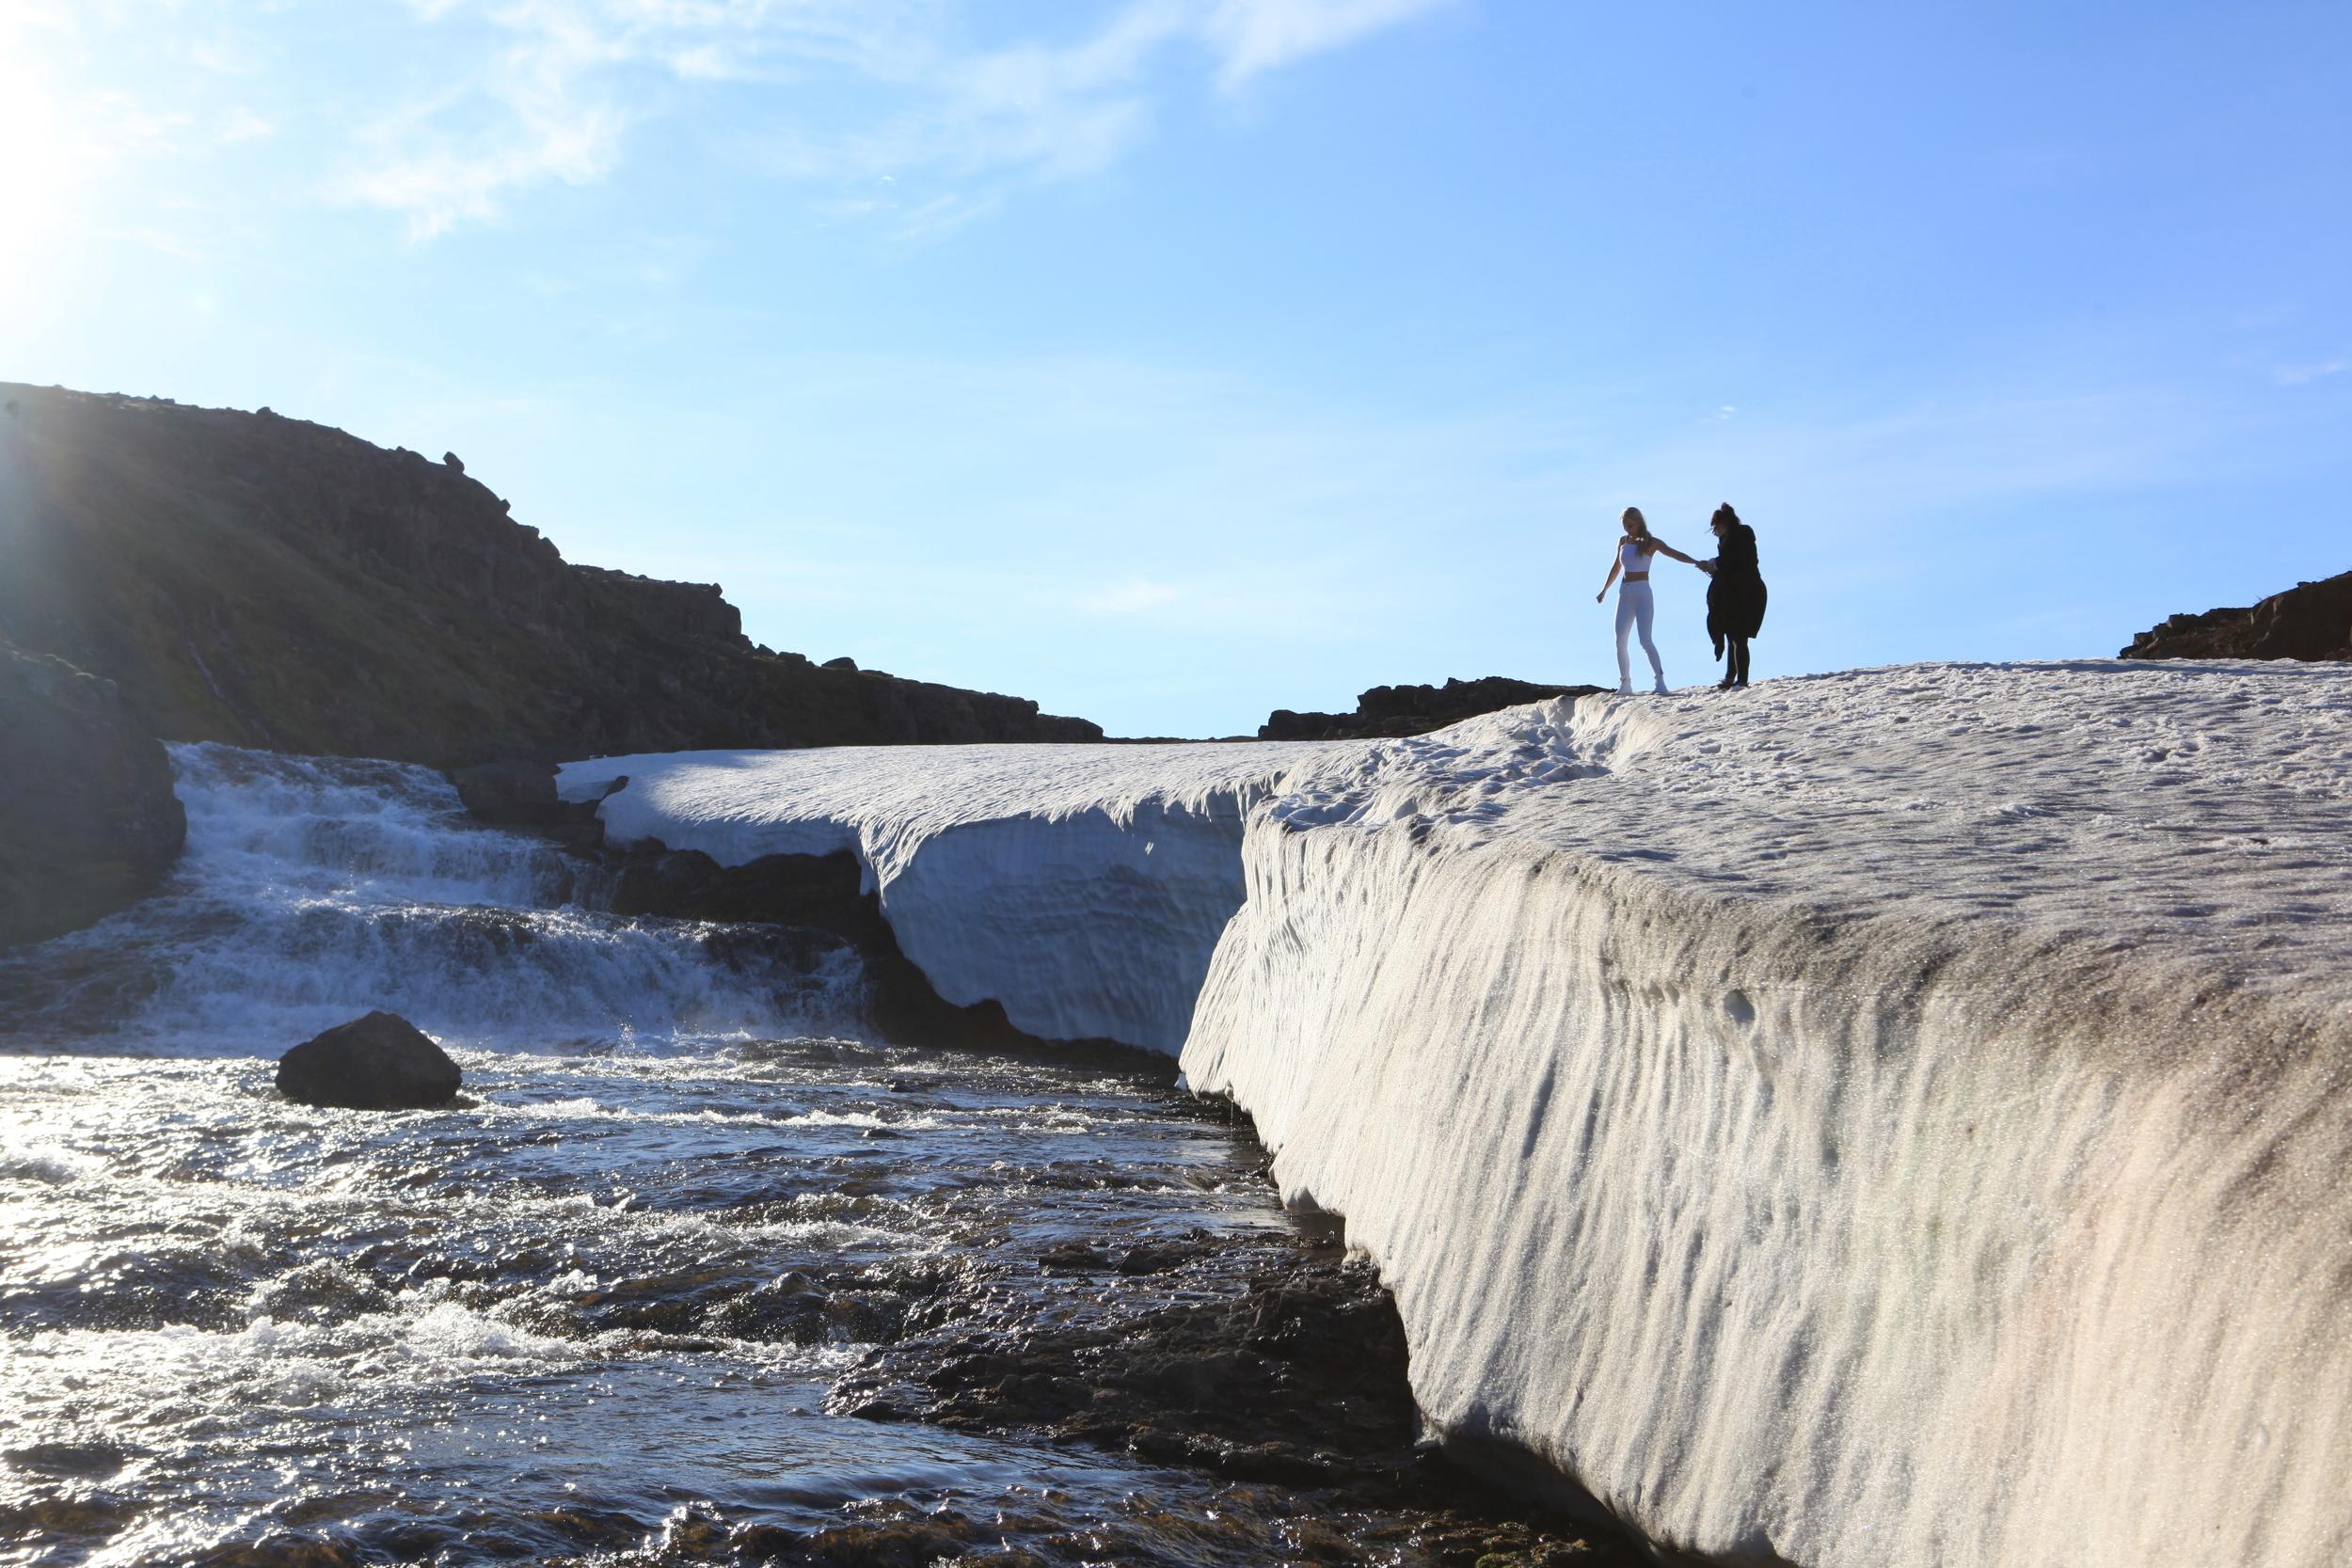 Walking the line between summer and winter